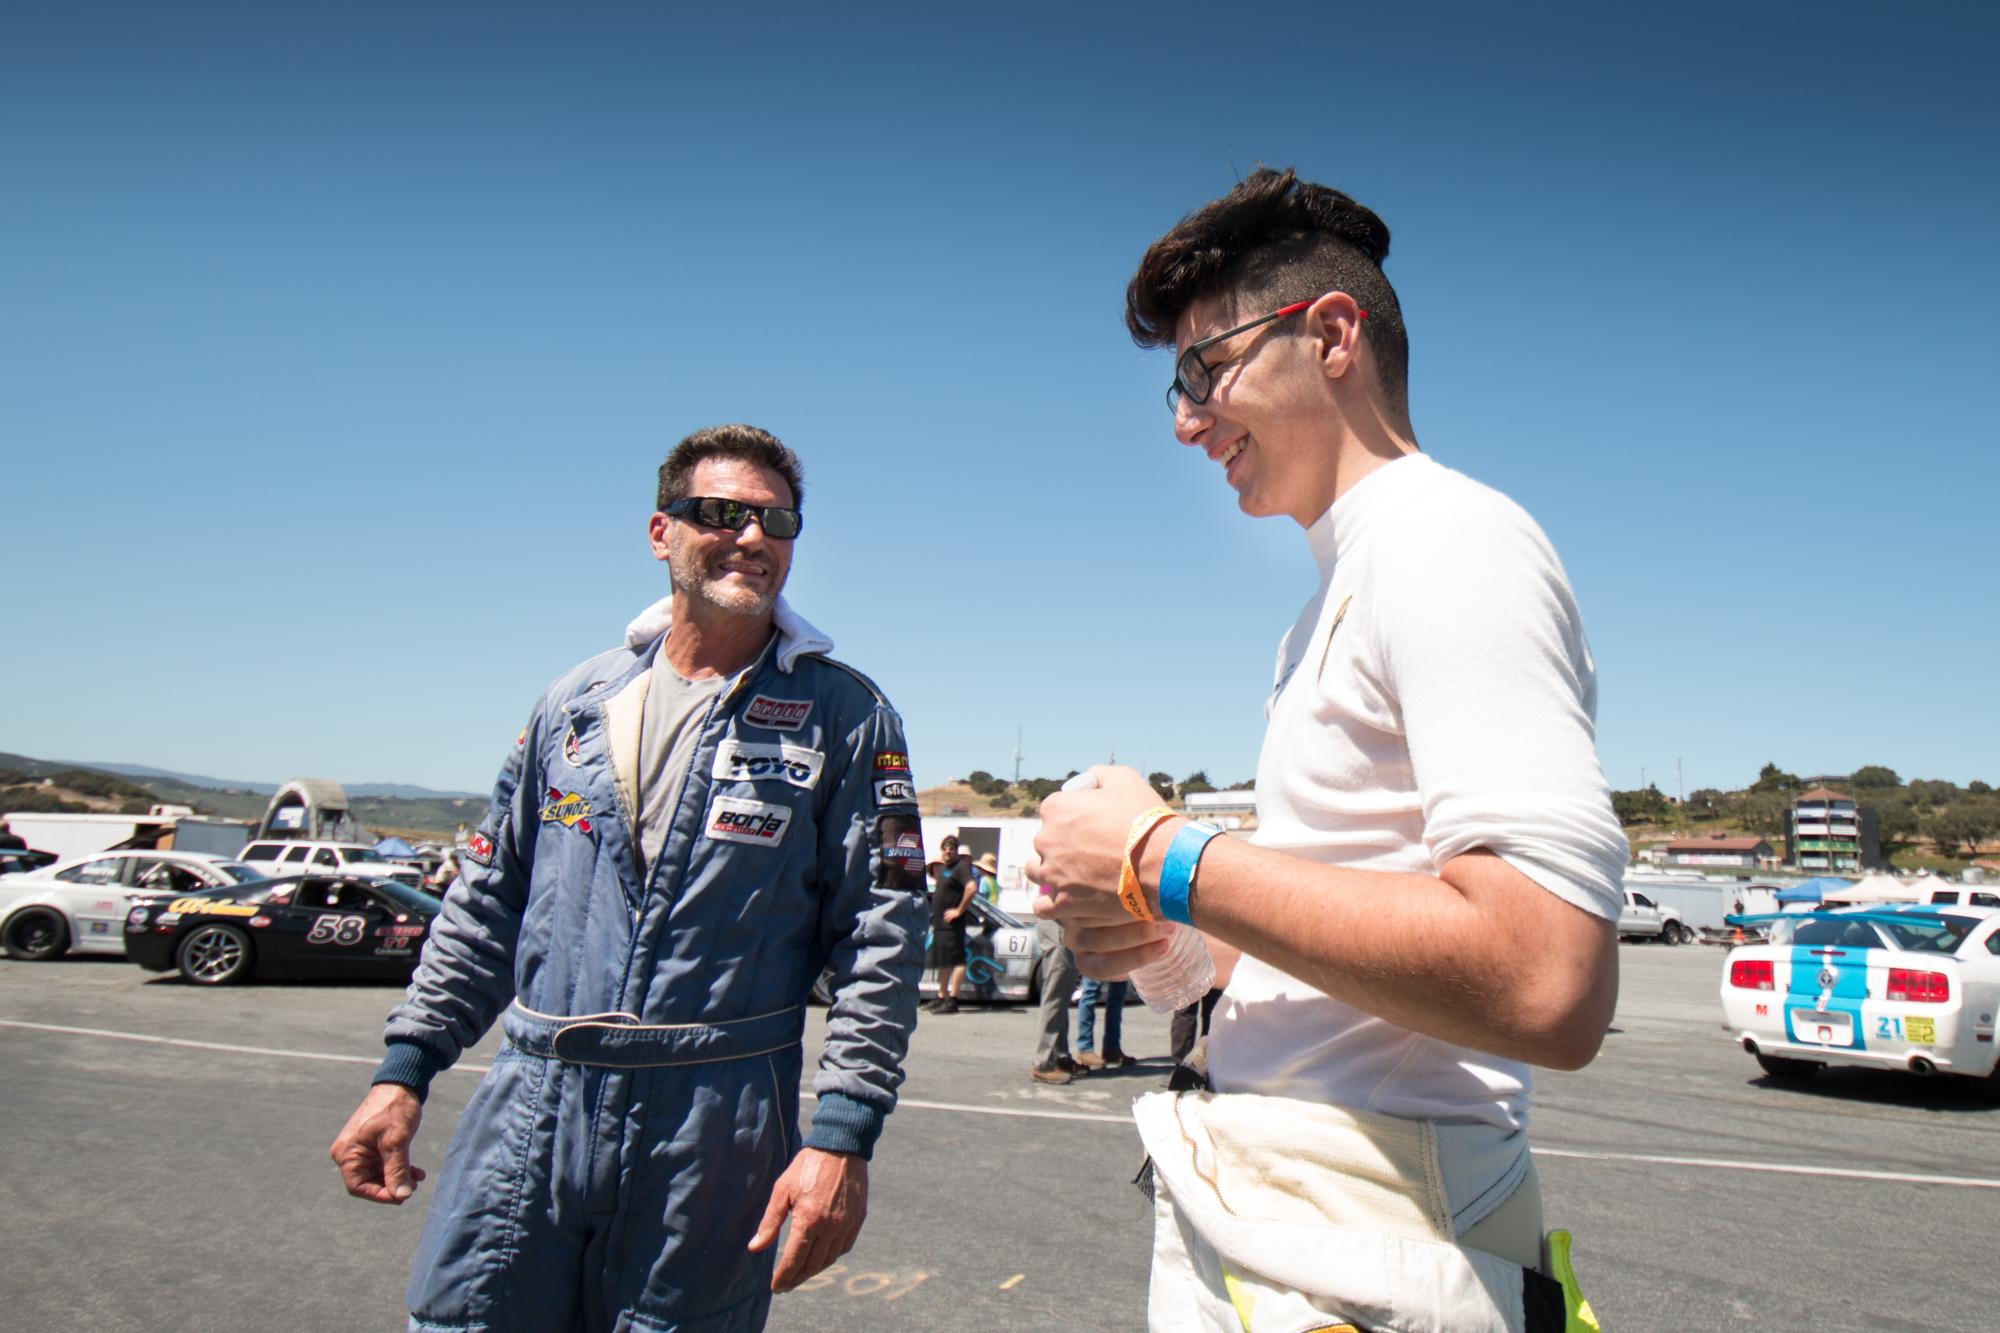 Steven-Racing-Laguna-20131002-96980.jpg